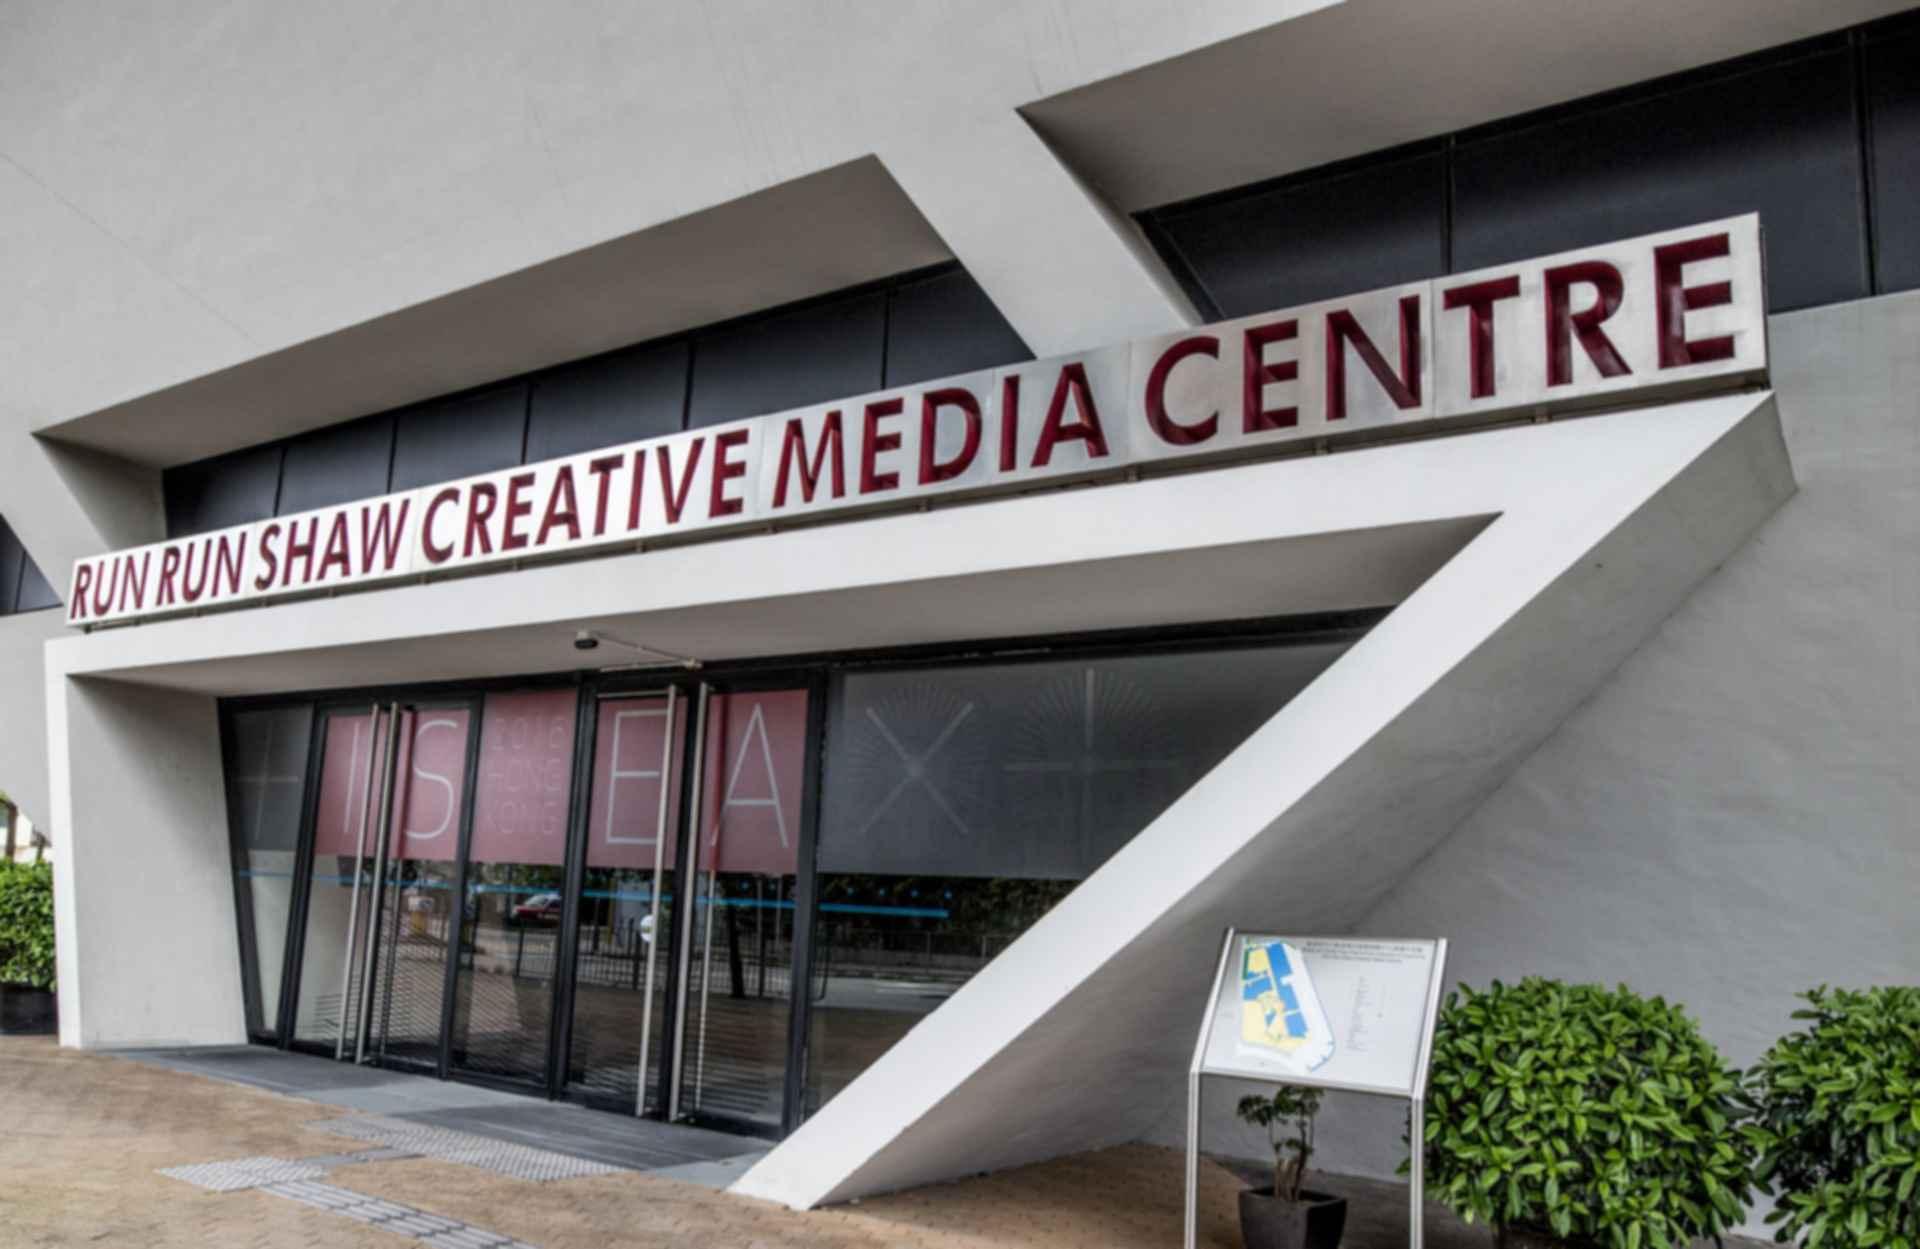 Run Run Shaw Creative Media Centre - Entrance